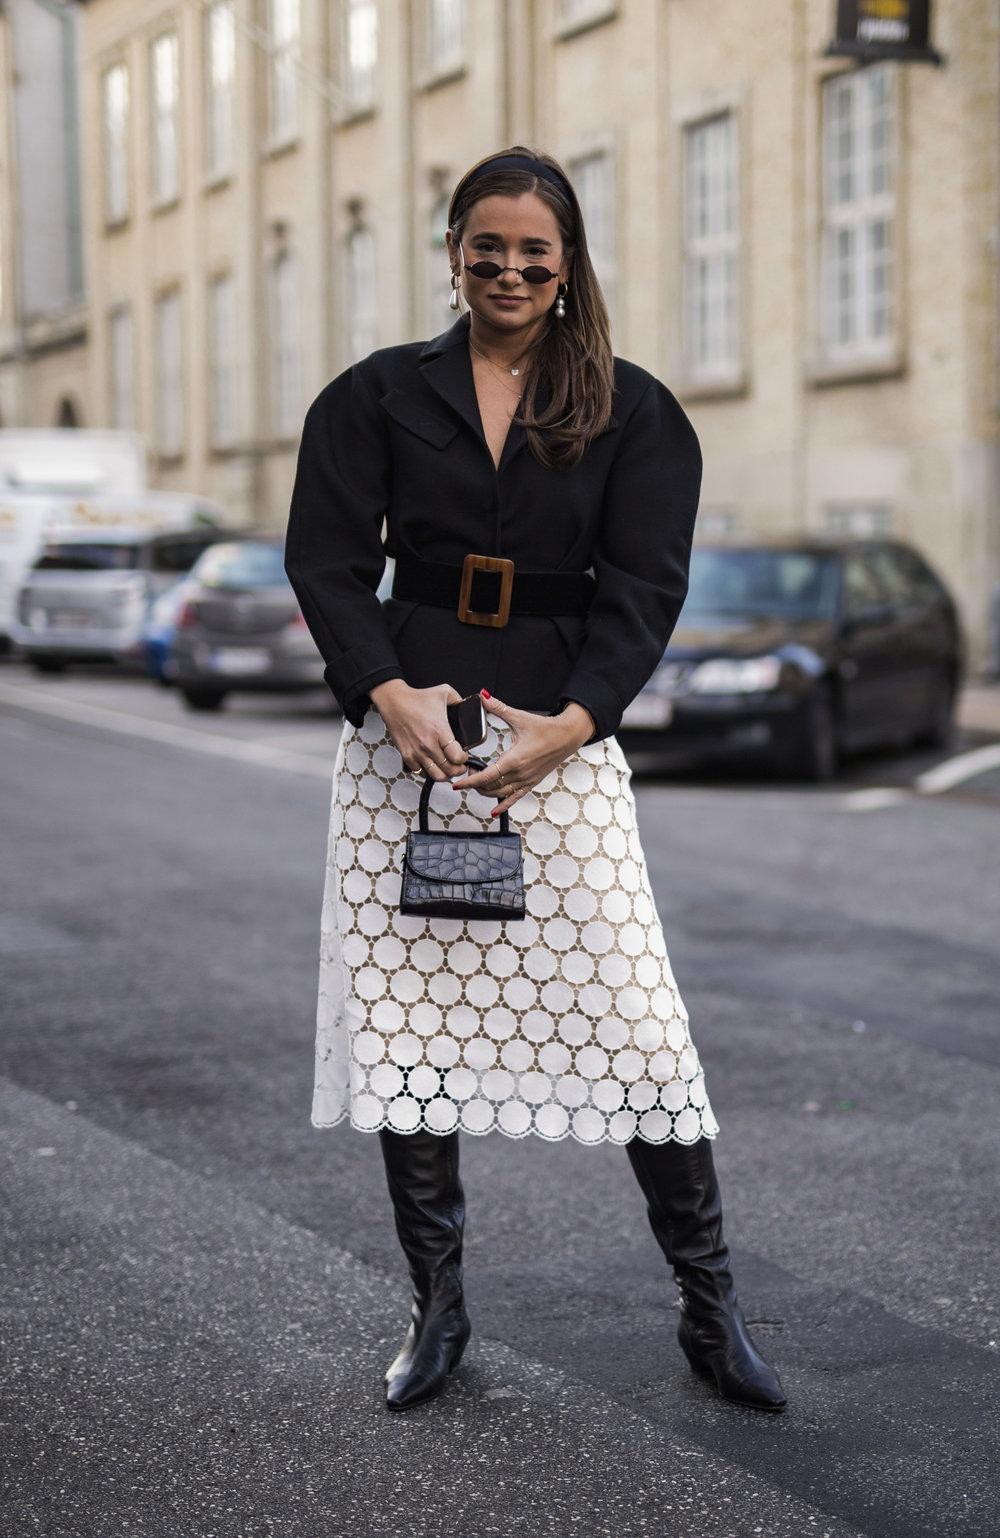 Streetstyle-Copenhagen-Fashion-Week-The-Streetland-Danielle-Bernstein-111.jpg